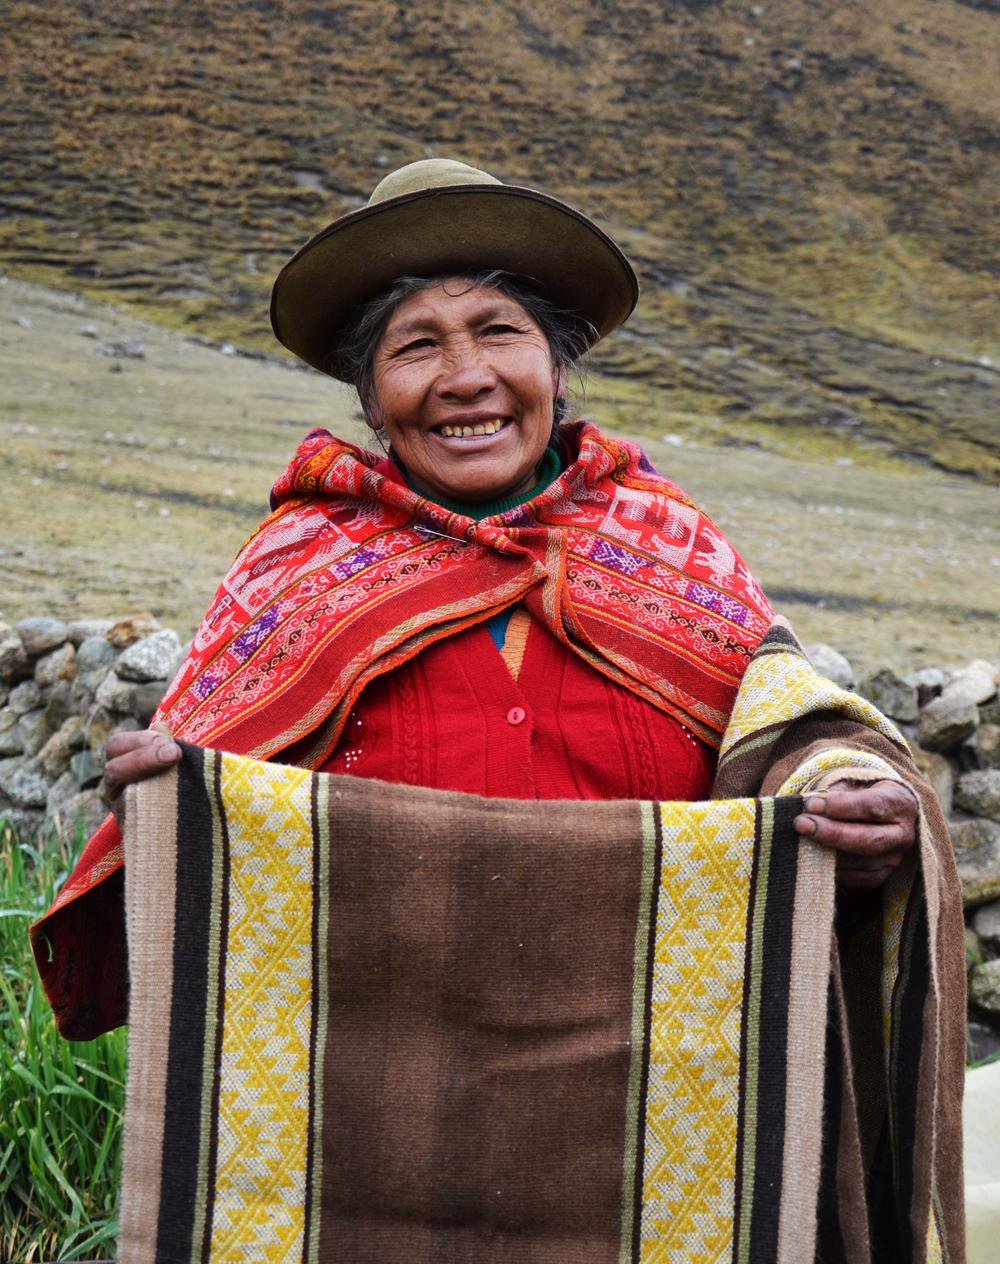 peru fair trade Textiles organic cusco threads of peru Andes quechua artisans